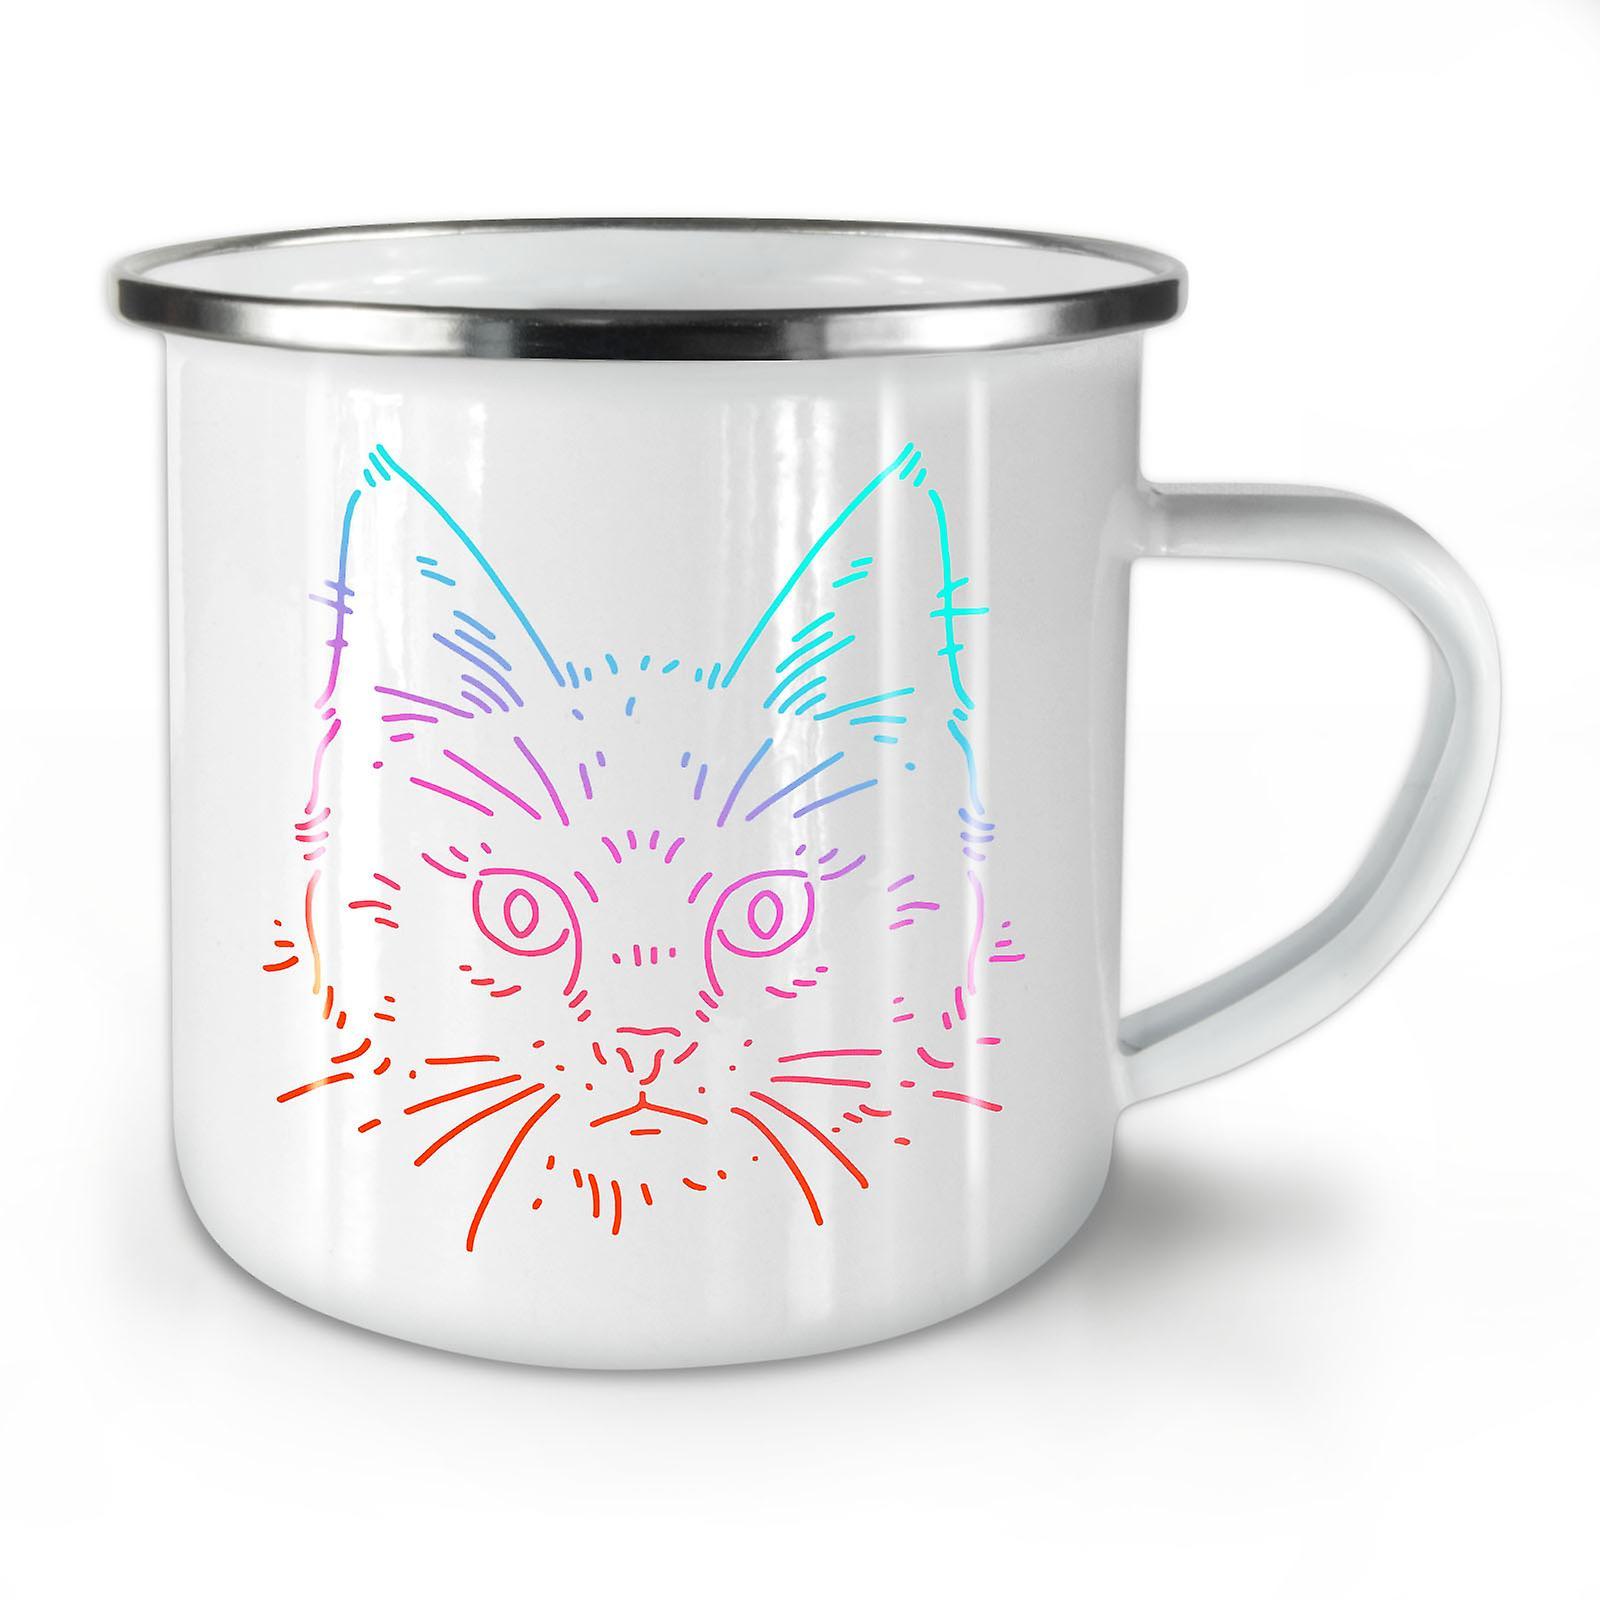 Nouveau Mug10 Chat Animal Face Café Émail Whitetea OzWellcoda gb67fYvy